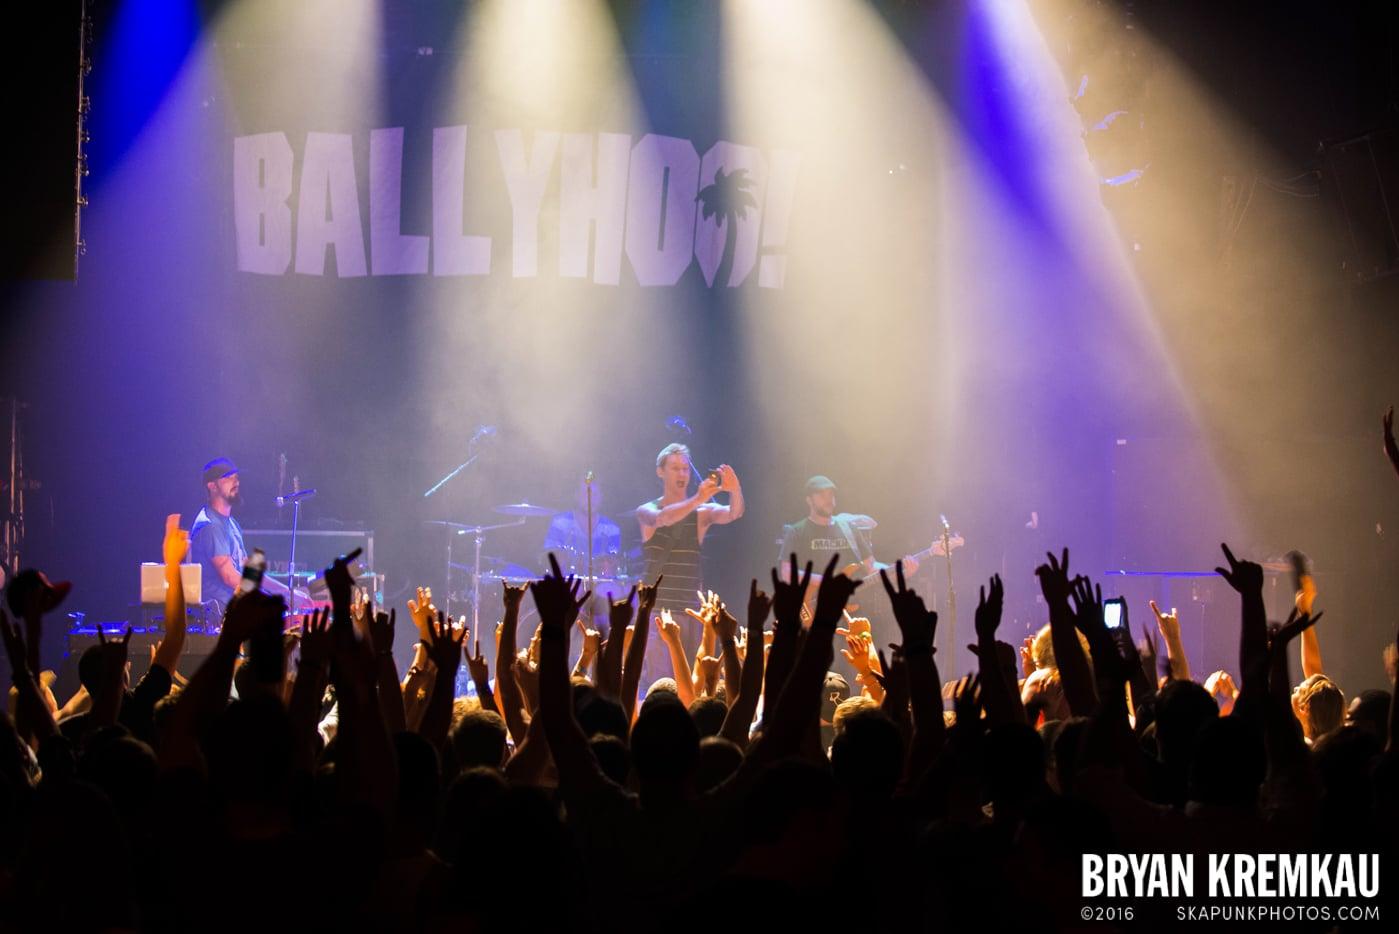 Ballyhoo! @ Gramercy Theatre, NYC - 6.27.13 (2)